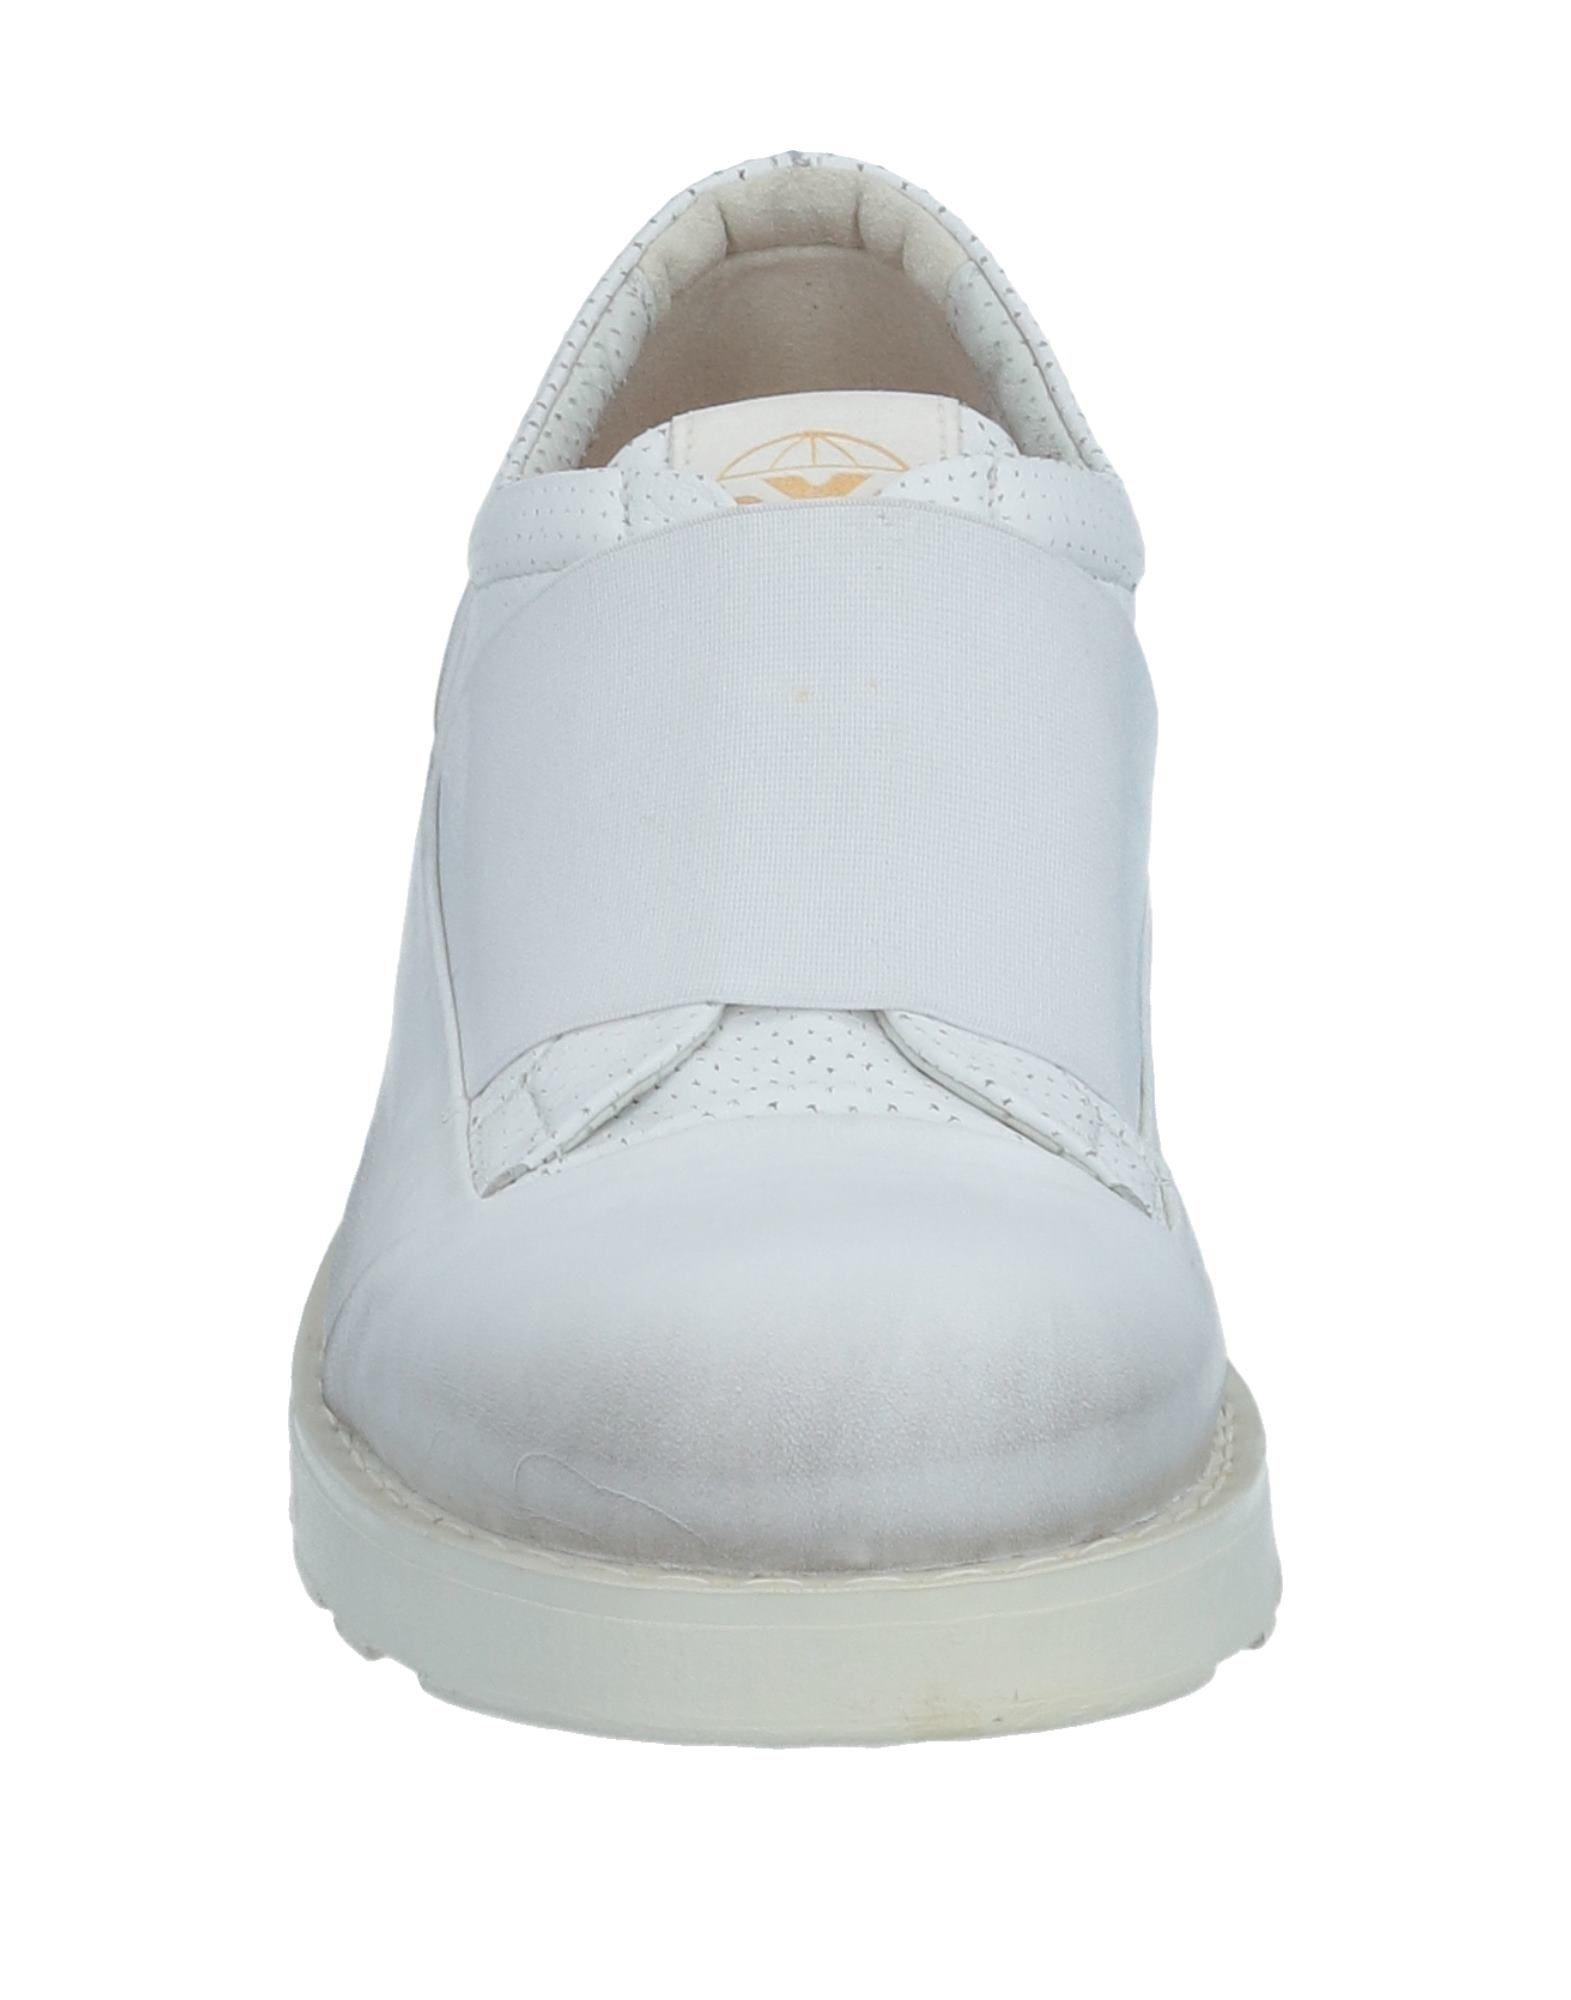 11518143GJ O.X.S. Sneakers Herren  11518143GJ  91d730